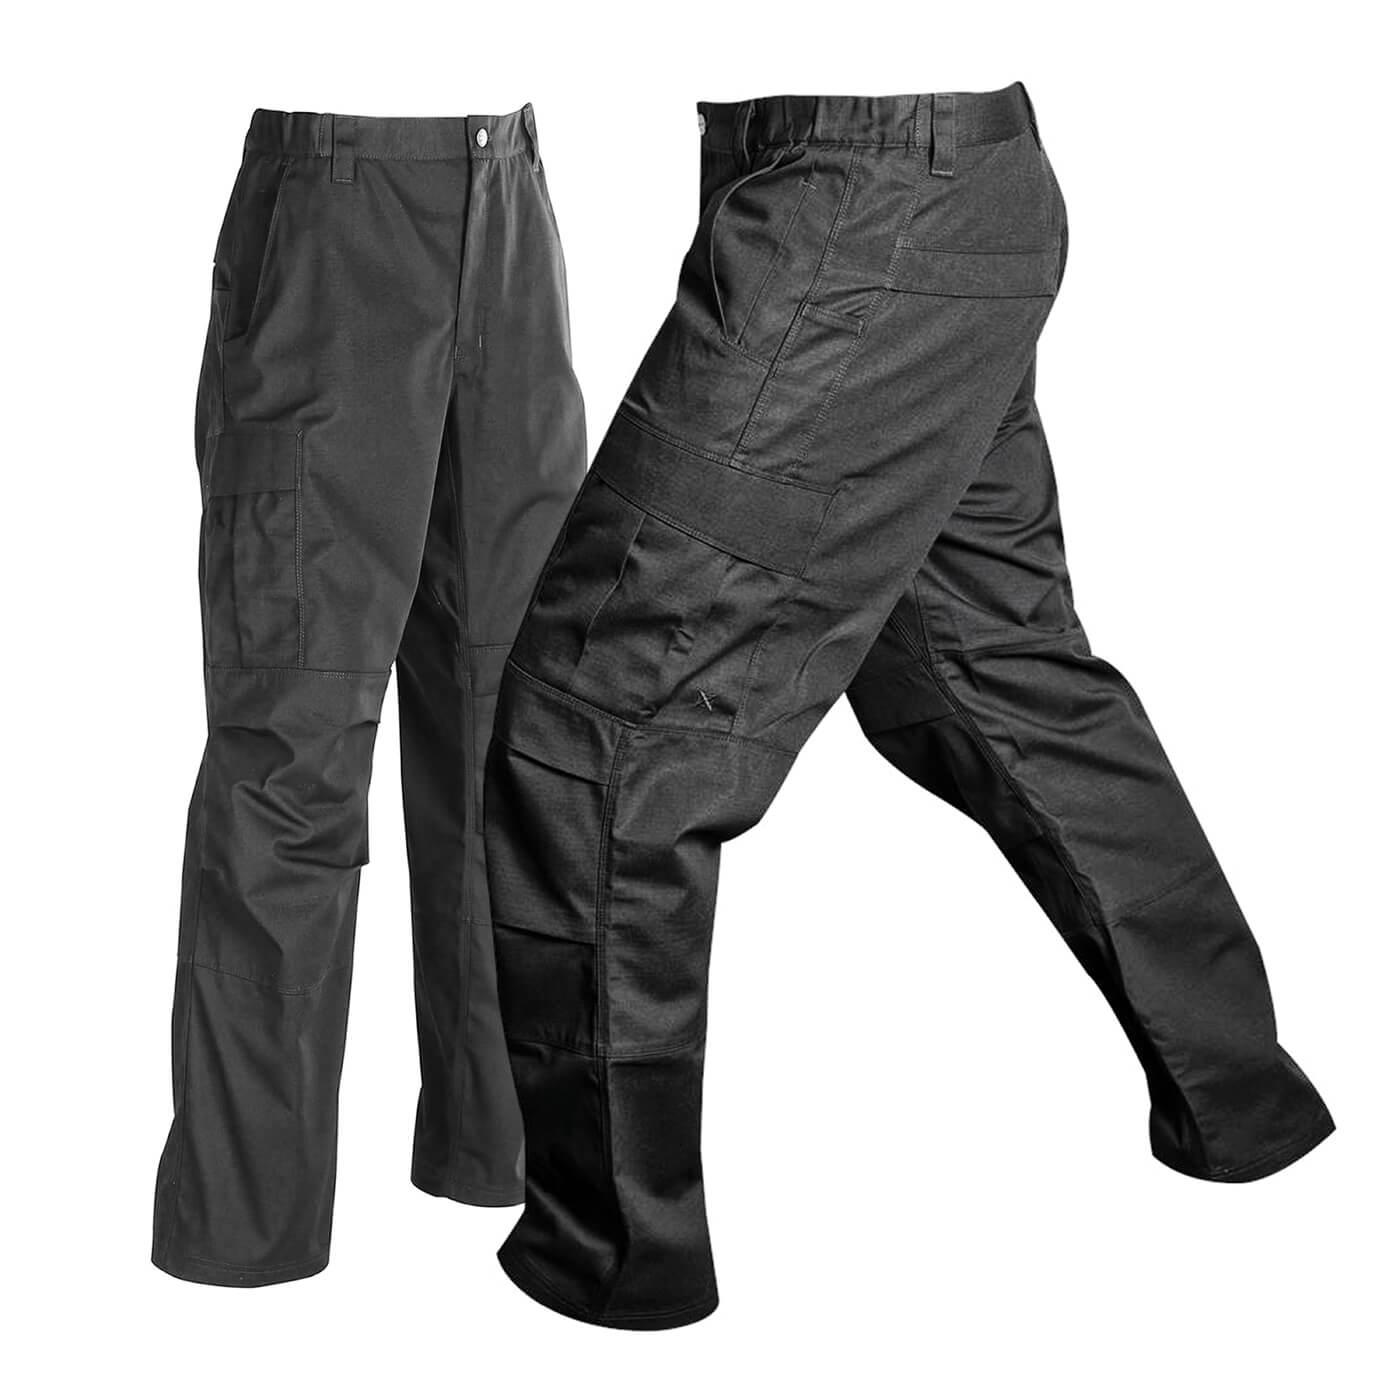 Vertx Phantom Ops Pants displayed